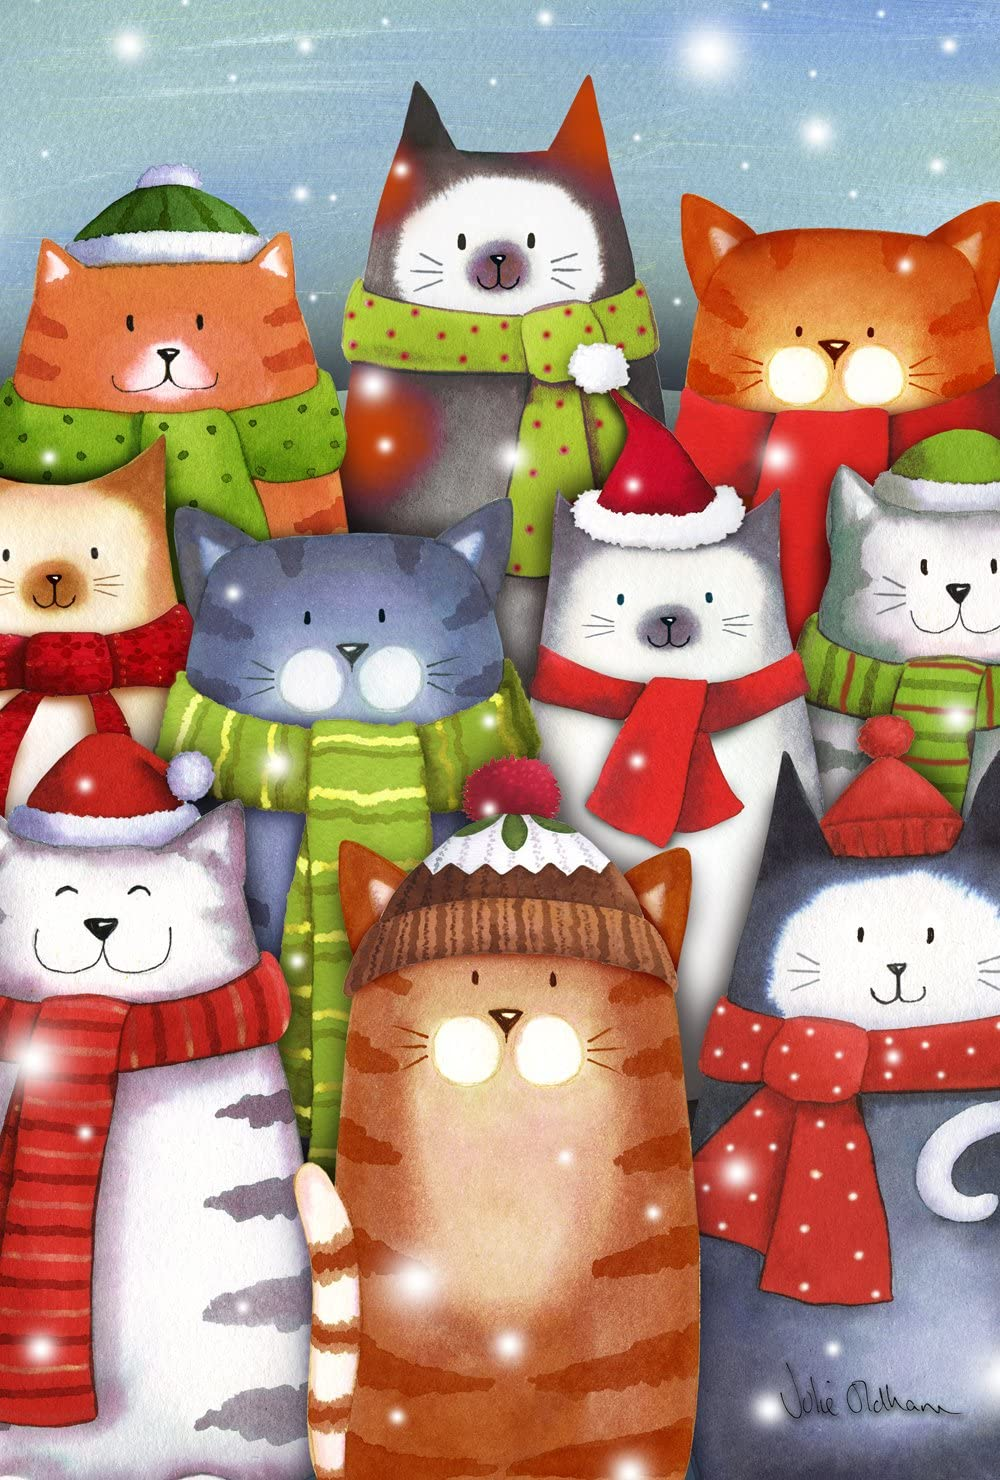 Toland Home Garden Cat Caroling 12.5 x 18 Inch Decorative Colorf